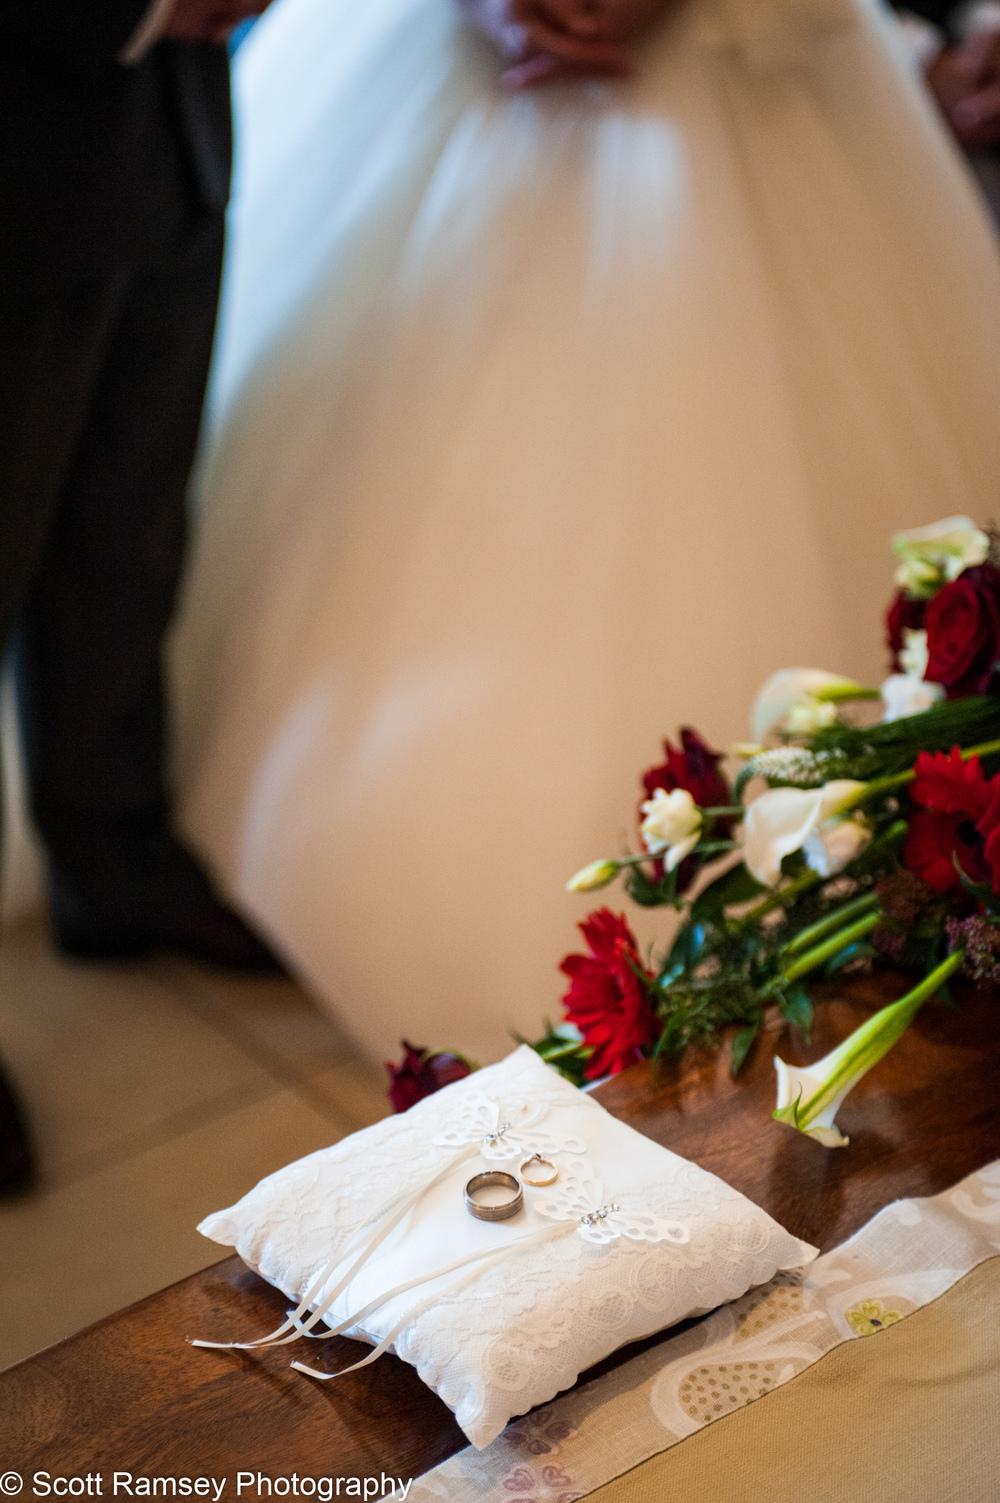 Upwaltham Barns Wedding Rings 15121216